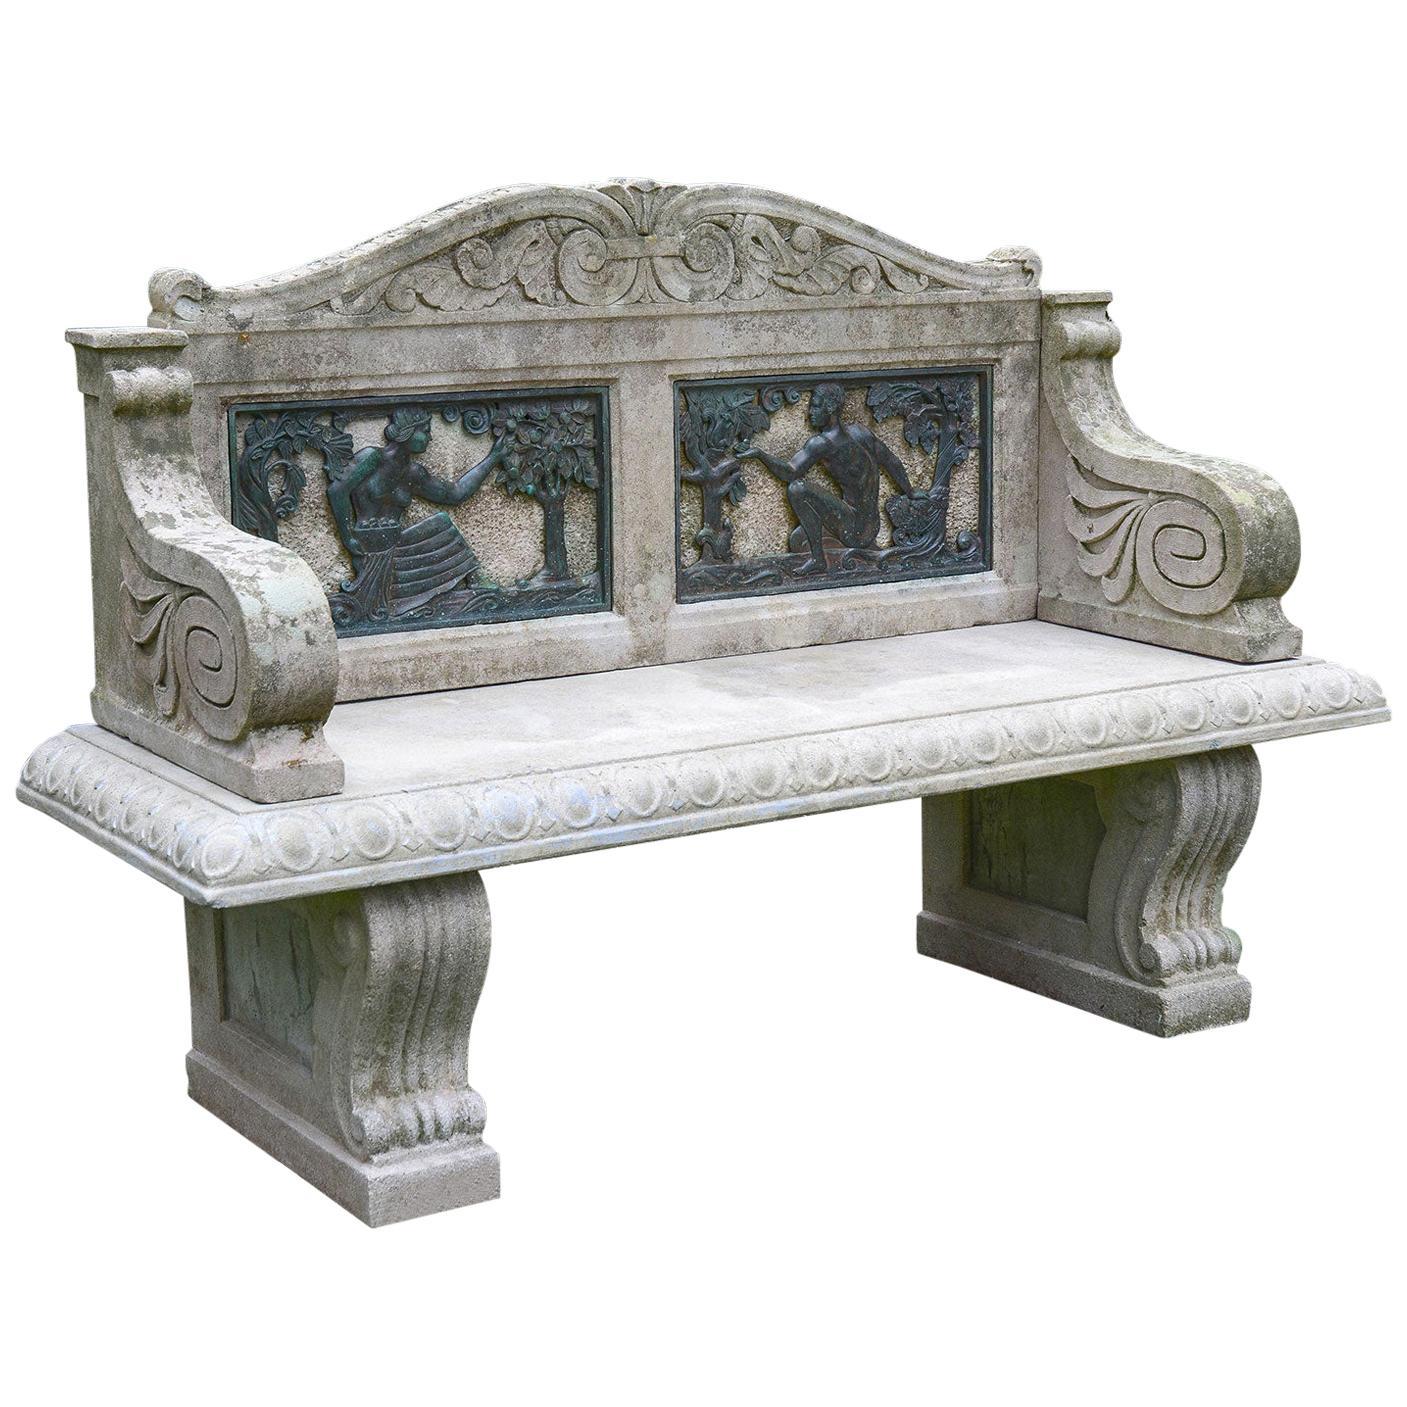 Stone Bench with Black Bronze Relief Sculptures